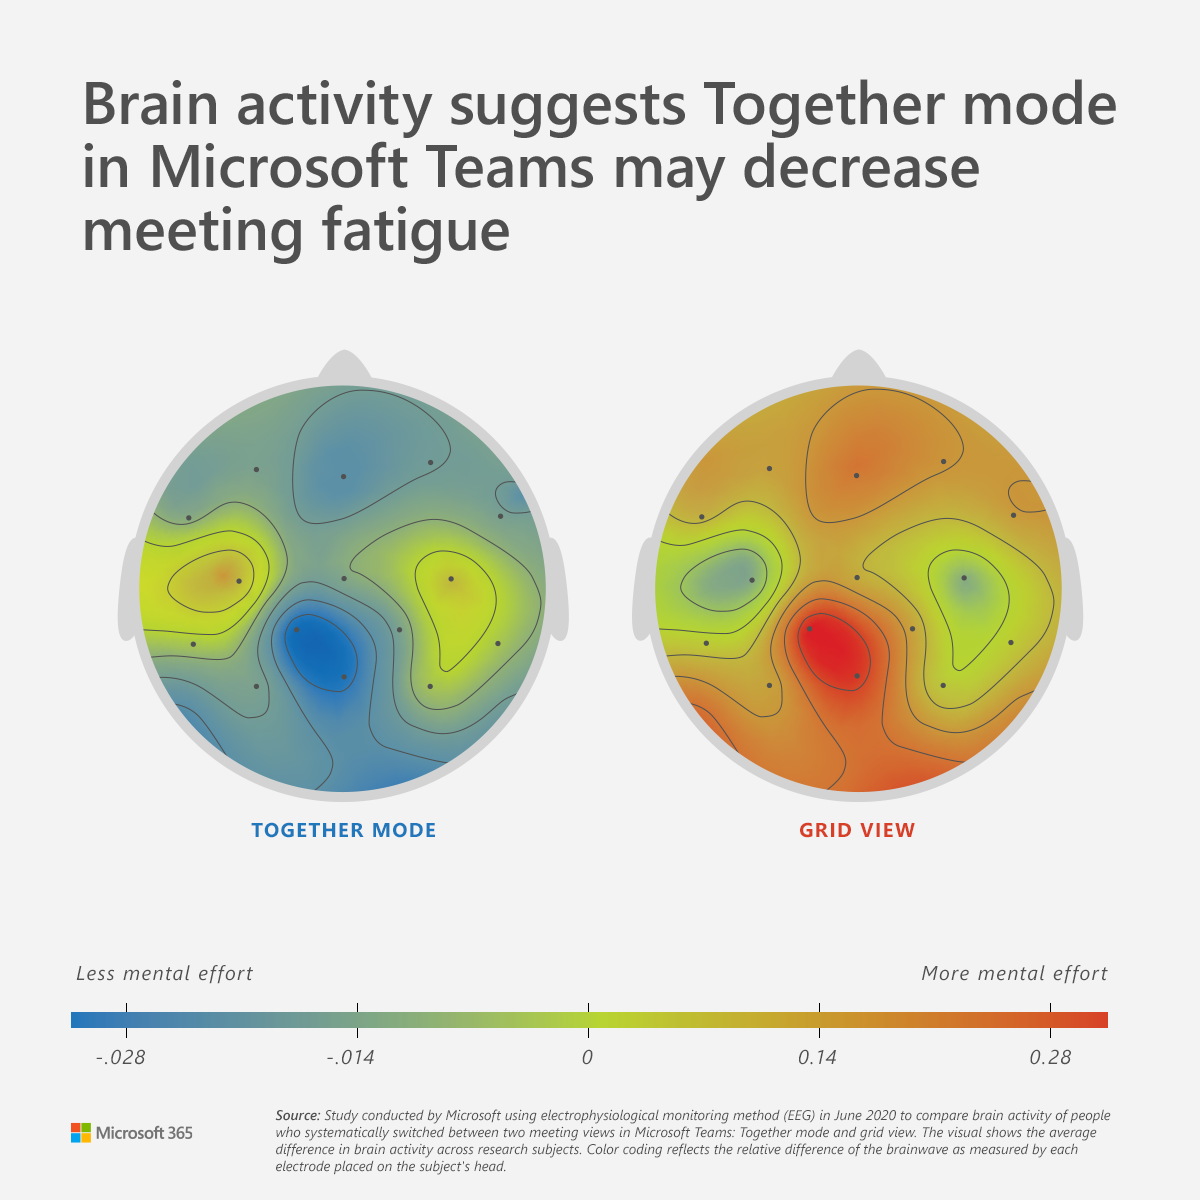 Microsoft Teams Together mode makes meetings more engaging using AI segmentation technology